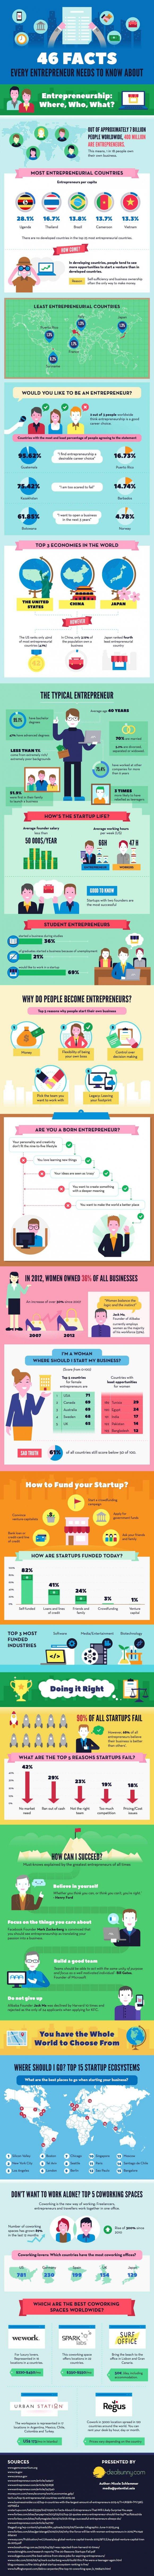 Infografik Entrepreneure und StartUps (Bild: Dealsunny)